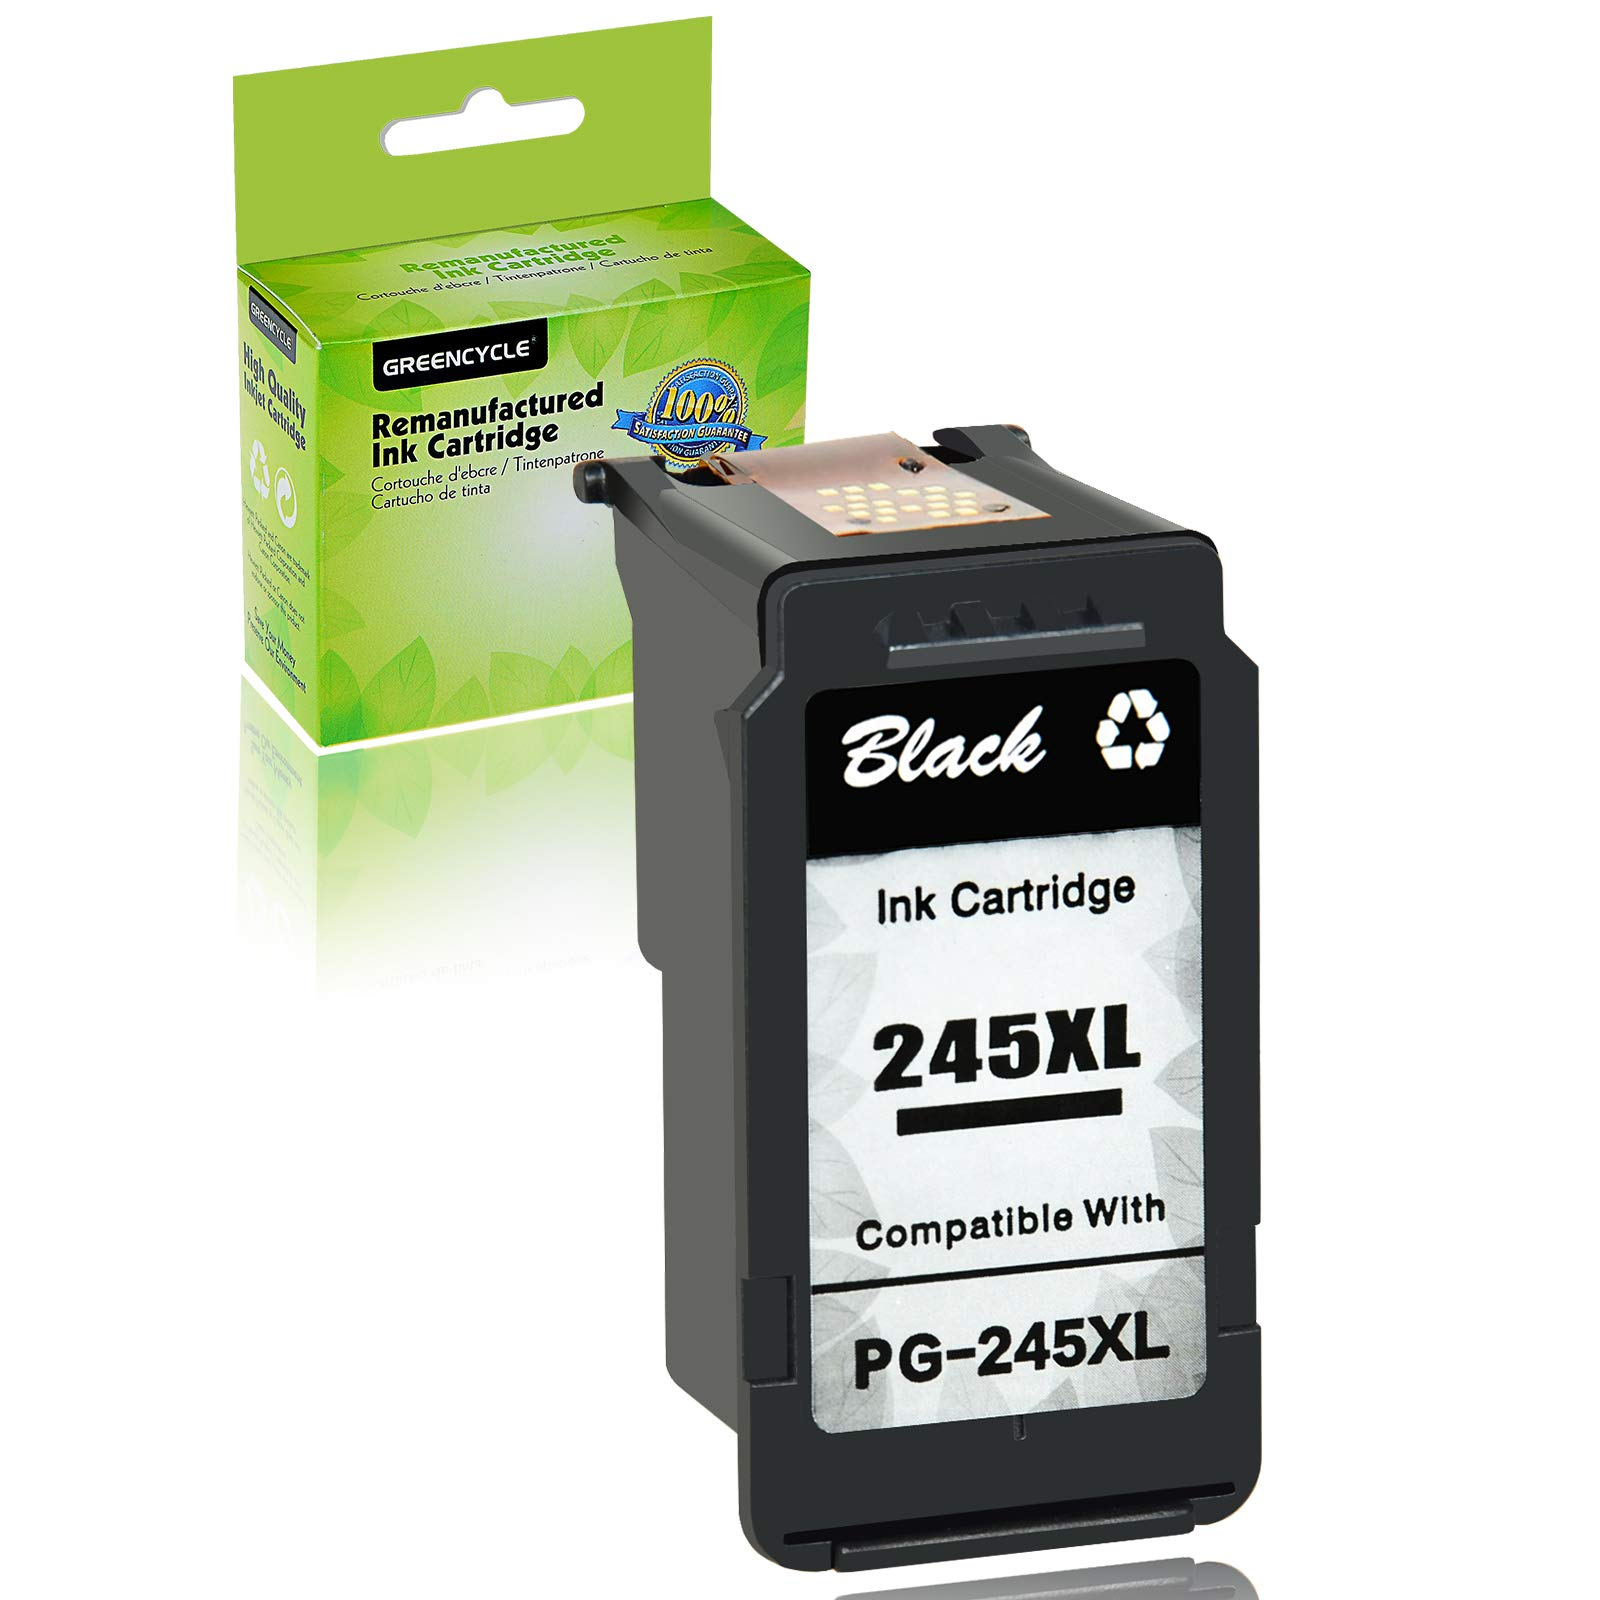 GREENCYCLE Re-Manufactured Ink Cartridge Compatible for Canon PG-245XL PG-245 245 XL Pixma MX490 MG2522 MG2525 MG2922 MG2924 MG3020 MG3022 MG3029 TS3120 TS3122 TS202 Printers (Black, 1 Pack)